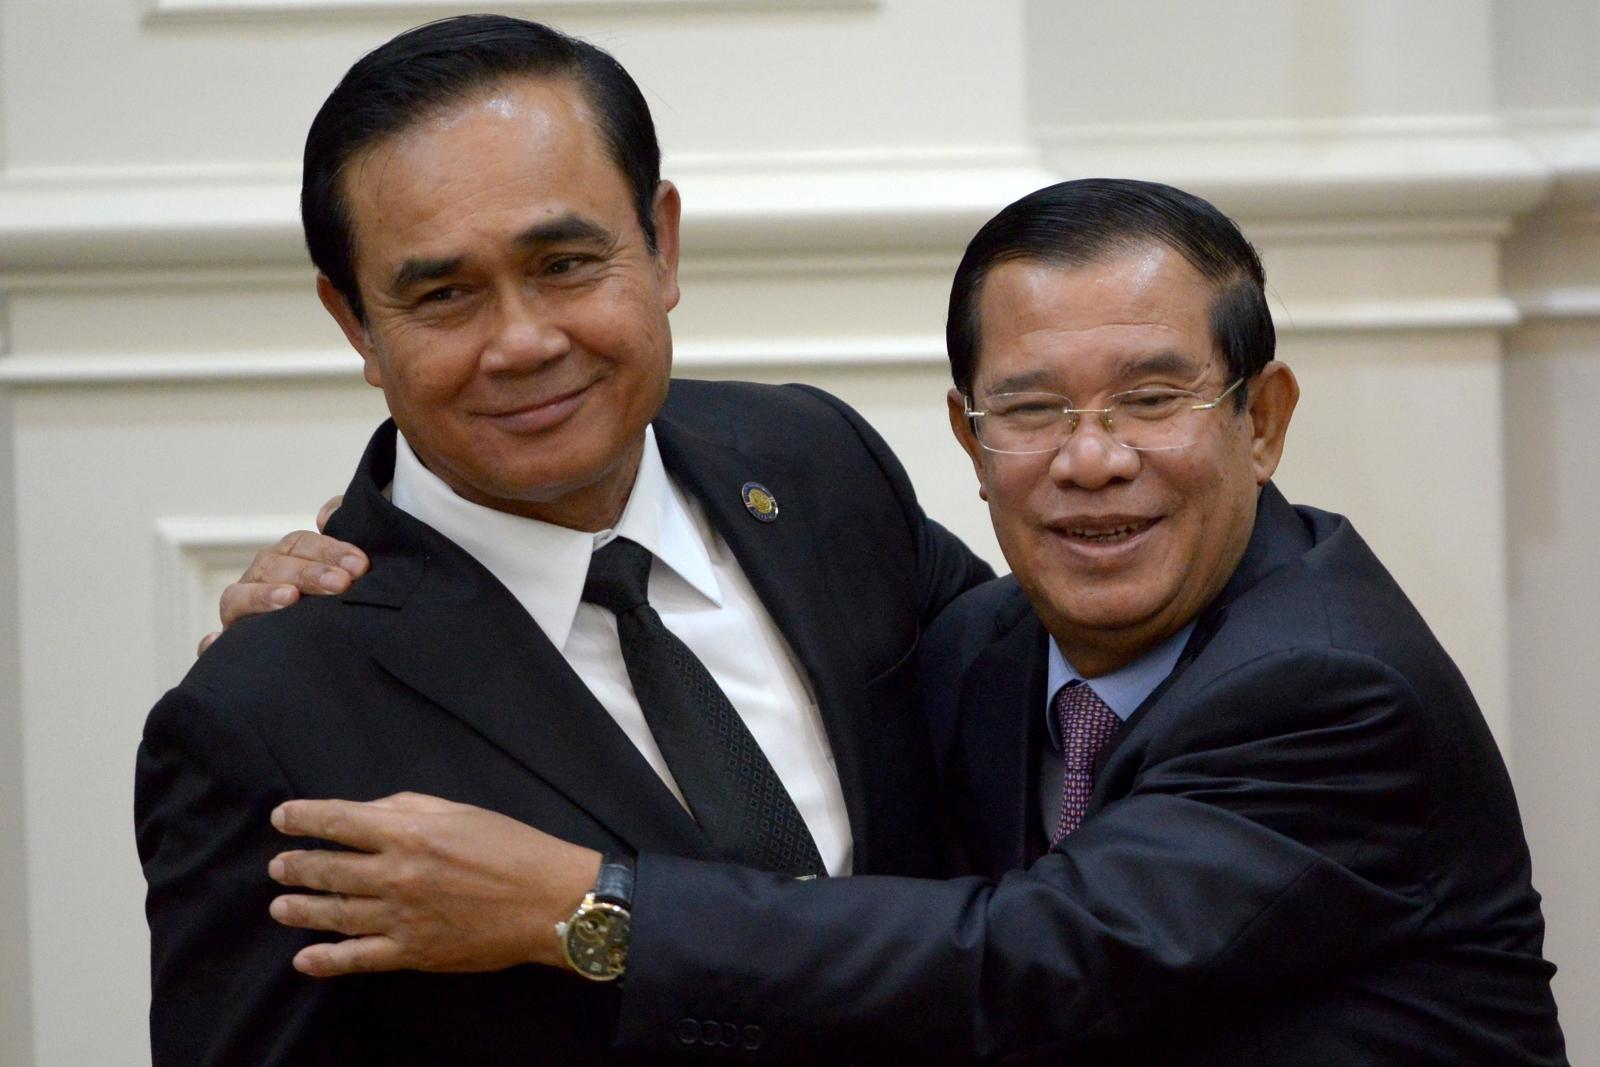 Cambodia's Hun Sen hugs Thailand's Prayut Chan-O-Cha